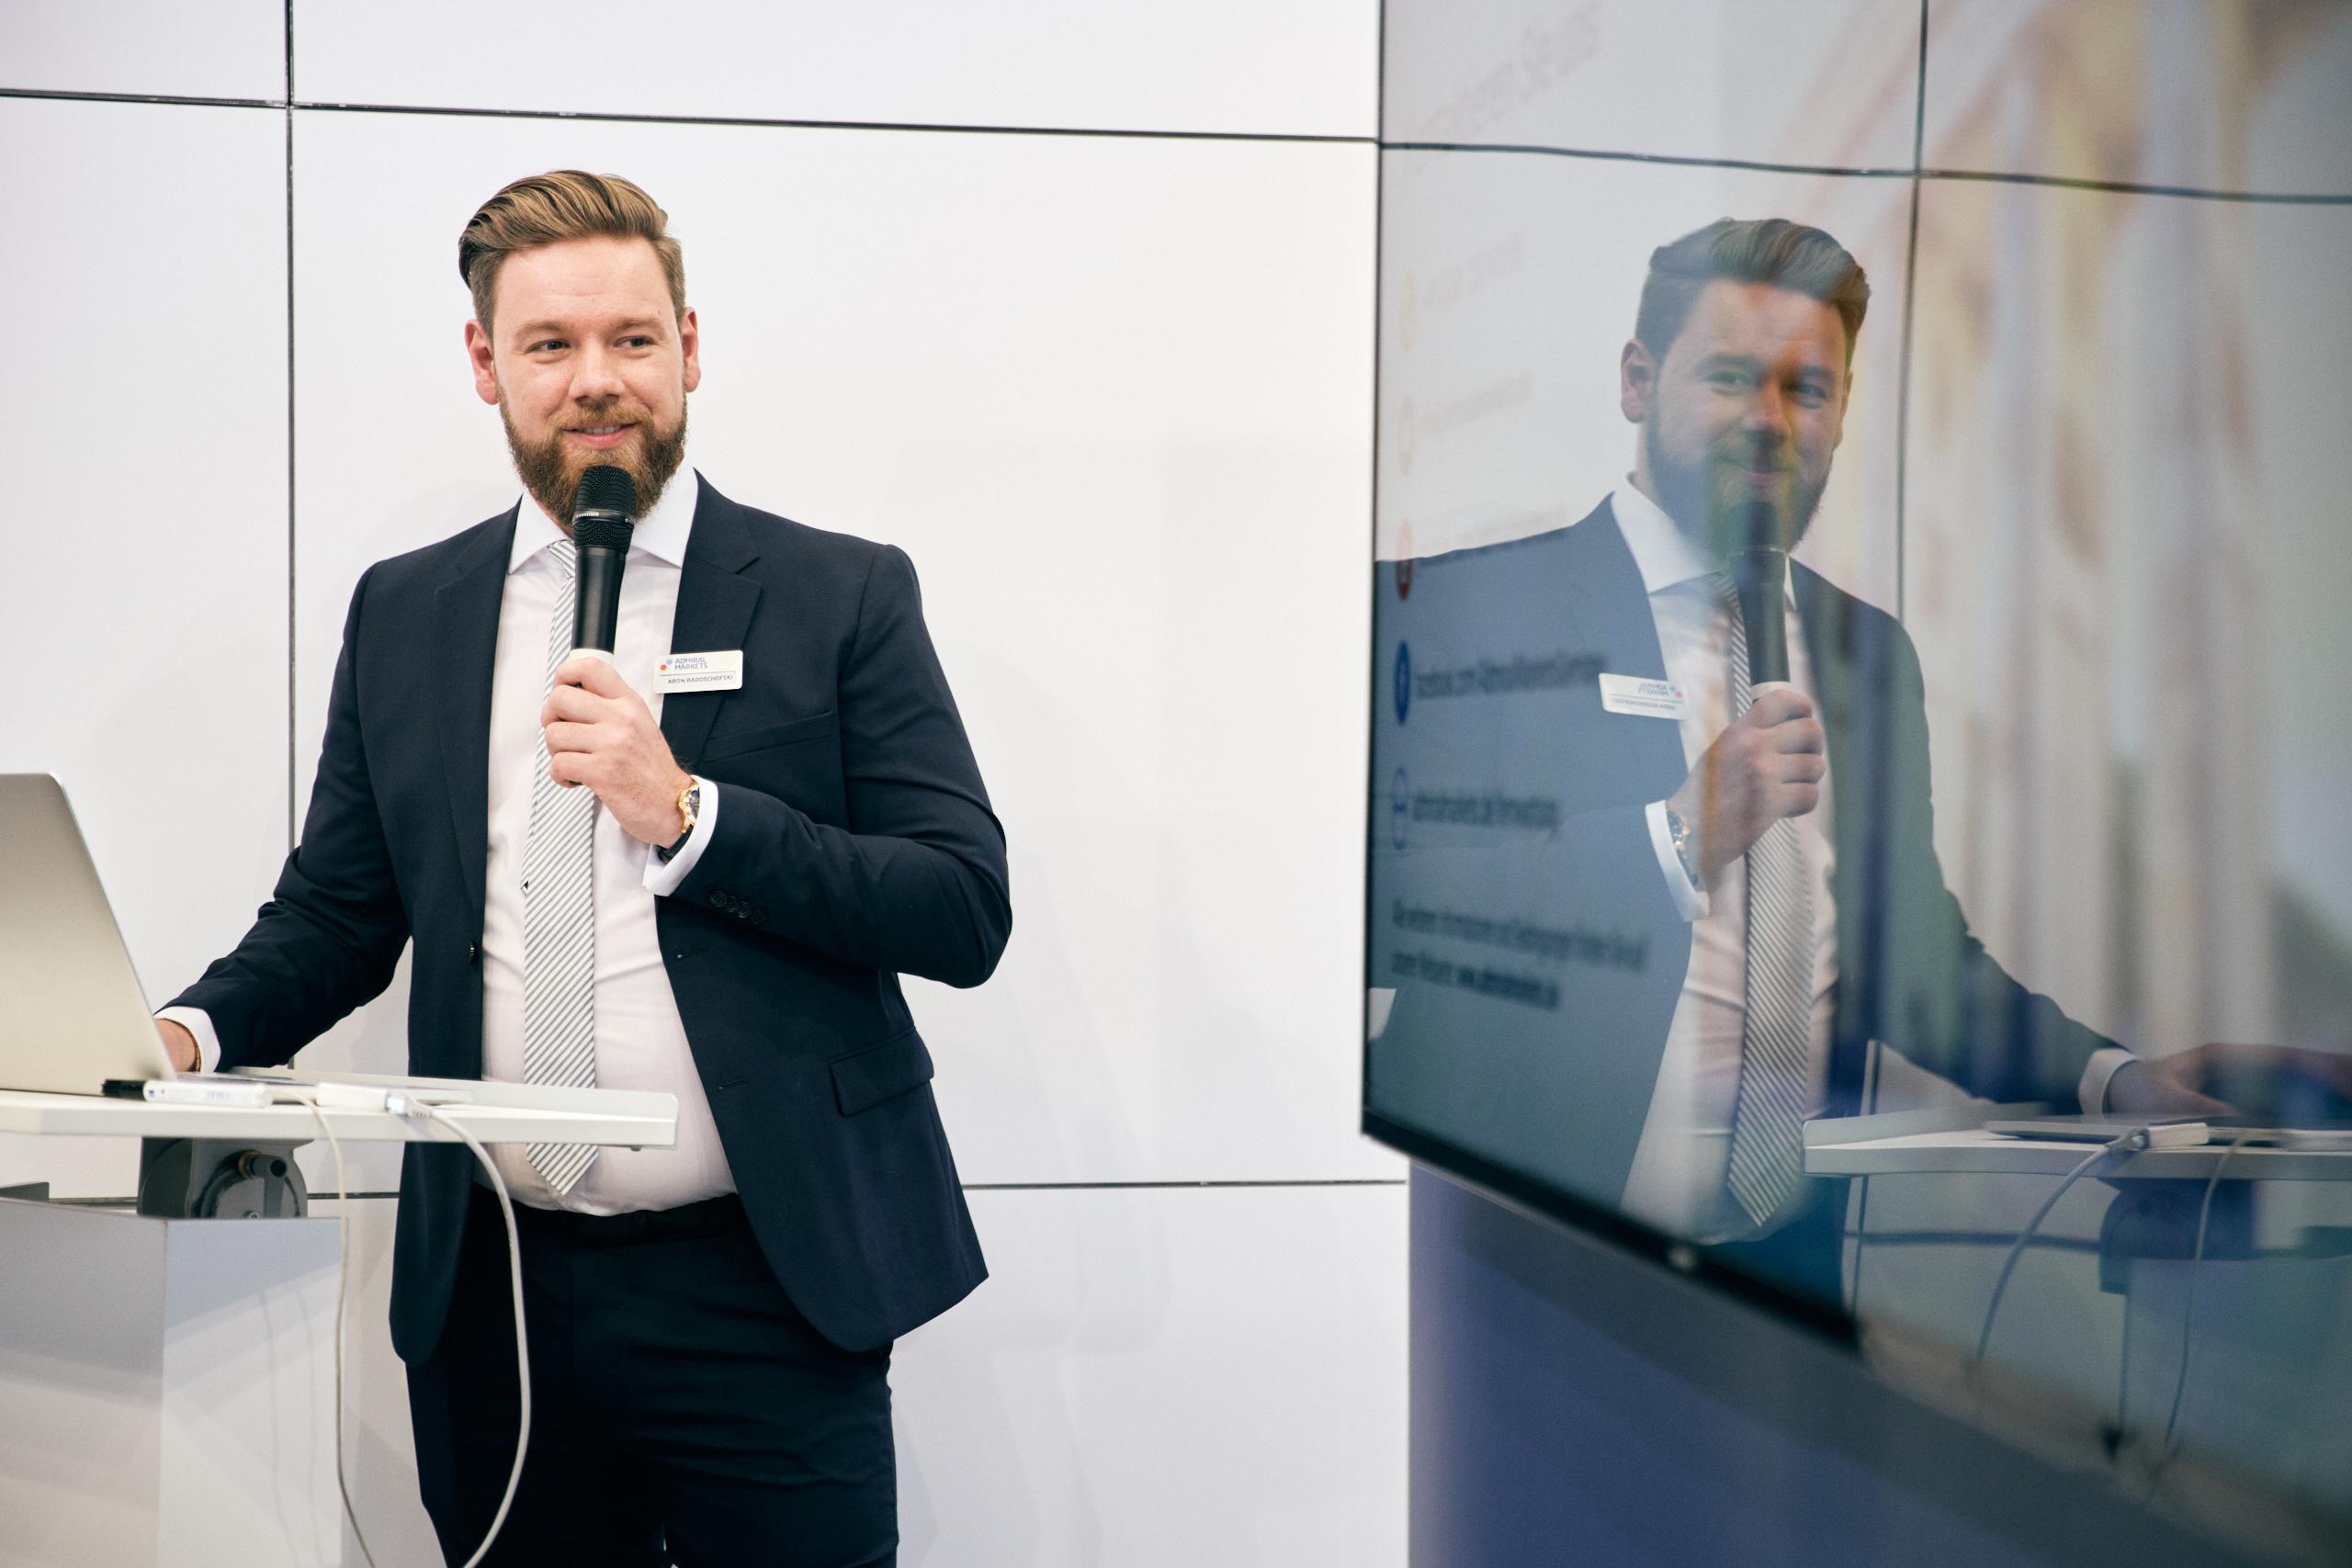 World-of-Trading-2019-Messe-Bericht-vom-Centre-Court-Kommentar-Jens-Chrzanowski-GodmodeTrader.de-4